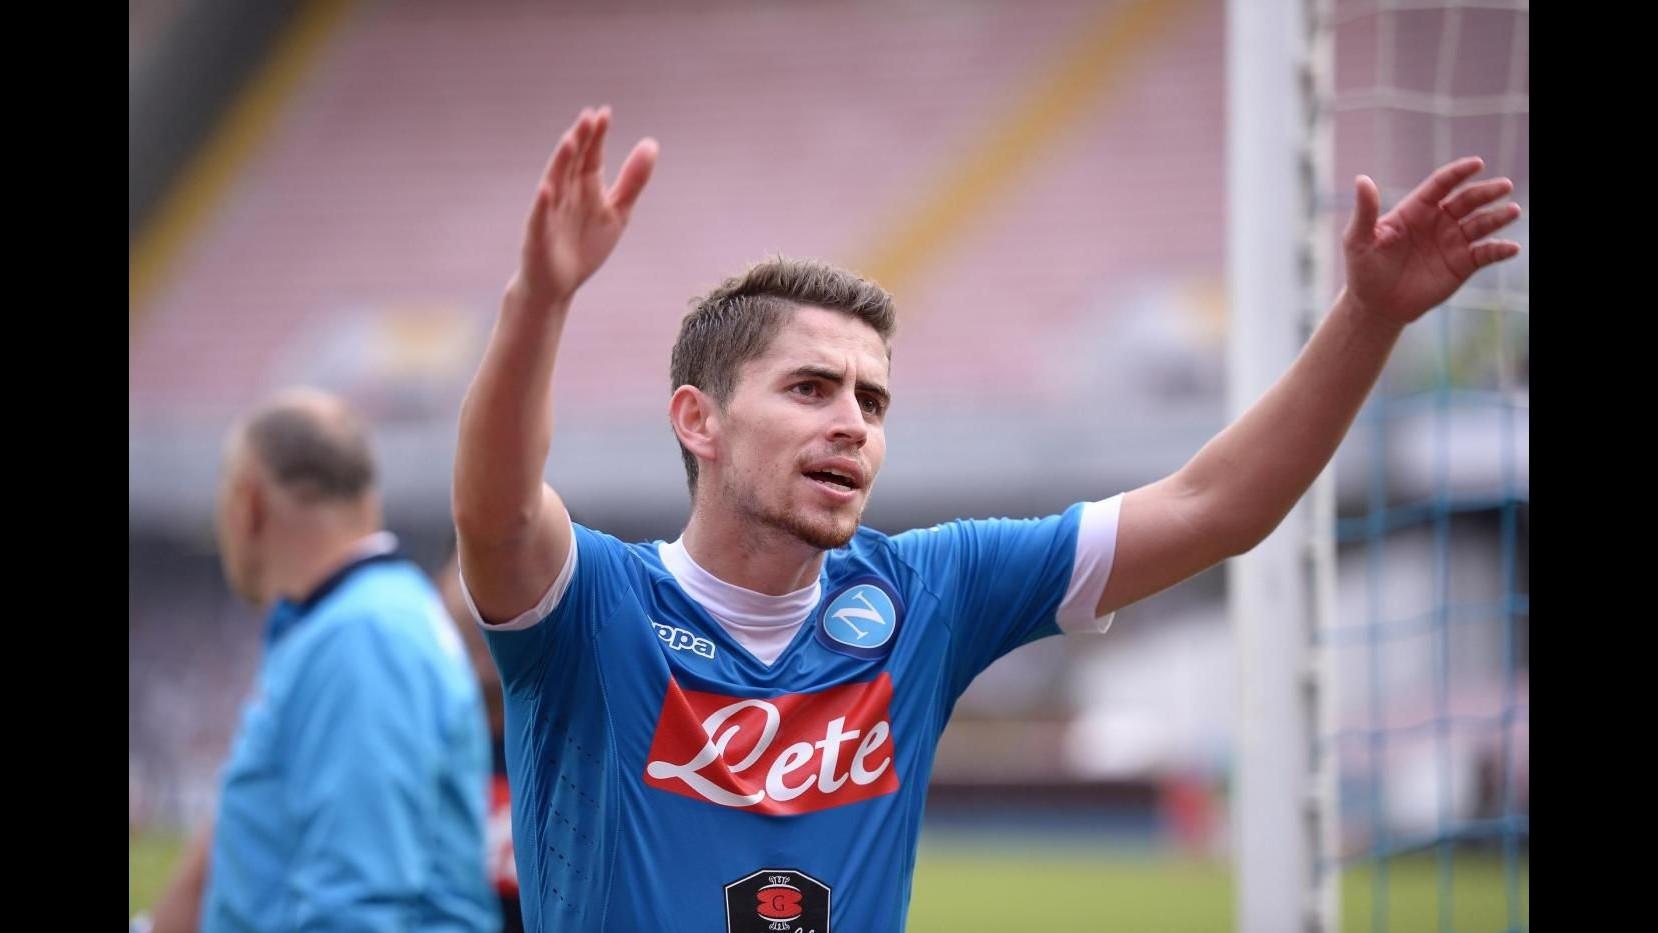 Napoli: Jorginho rinnova fino al 2020